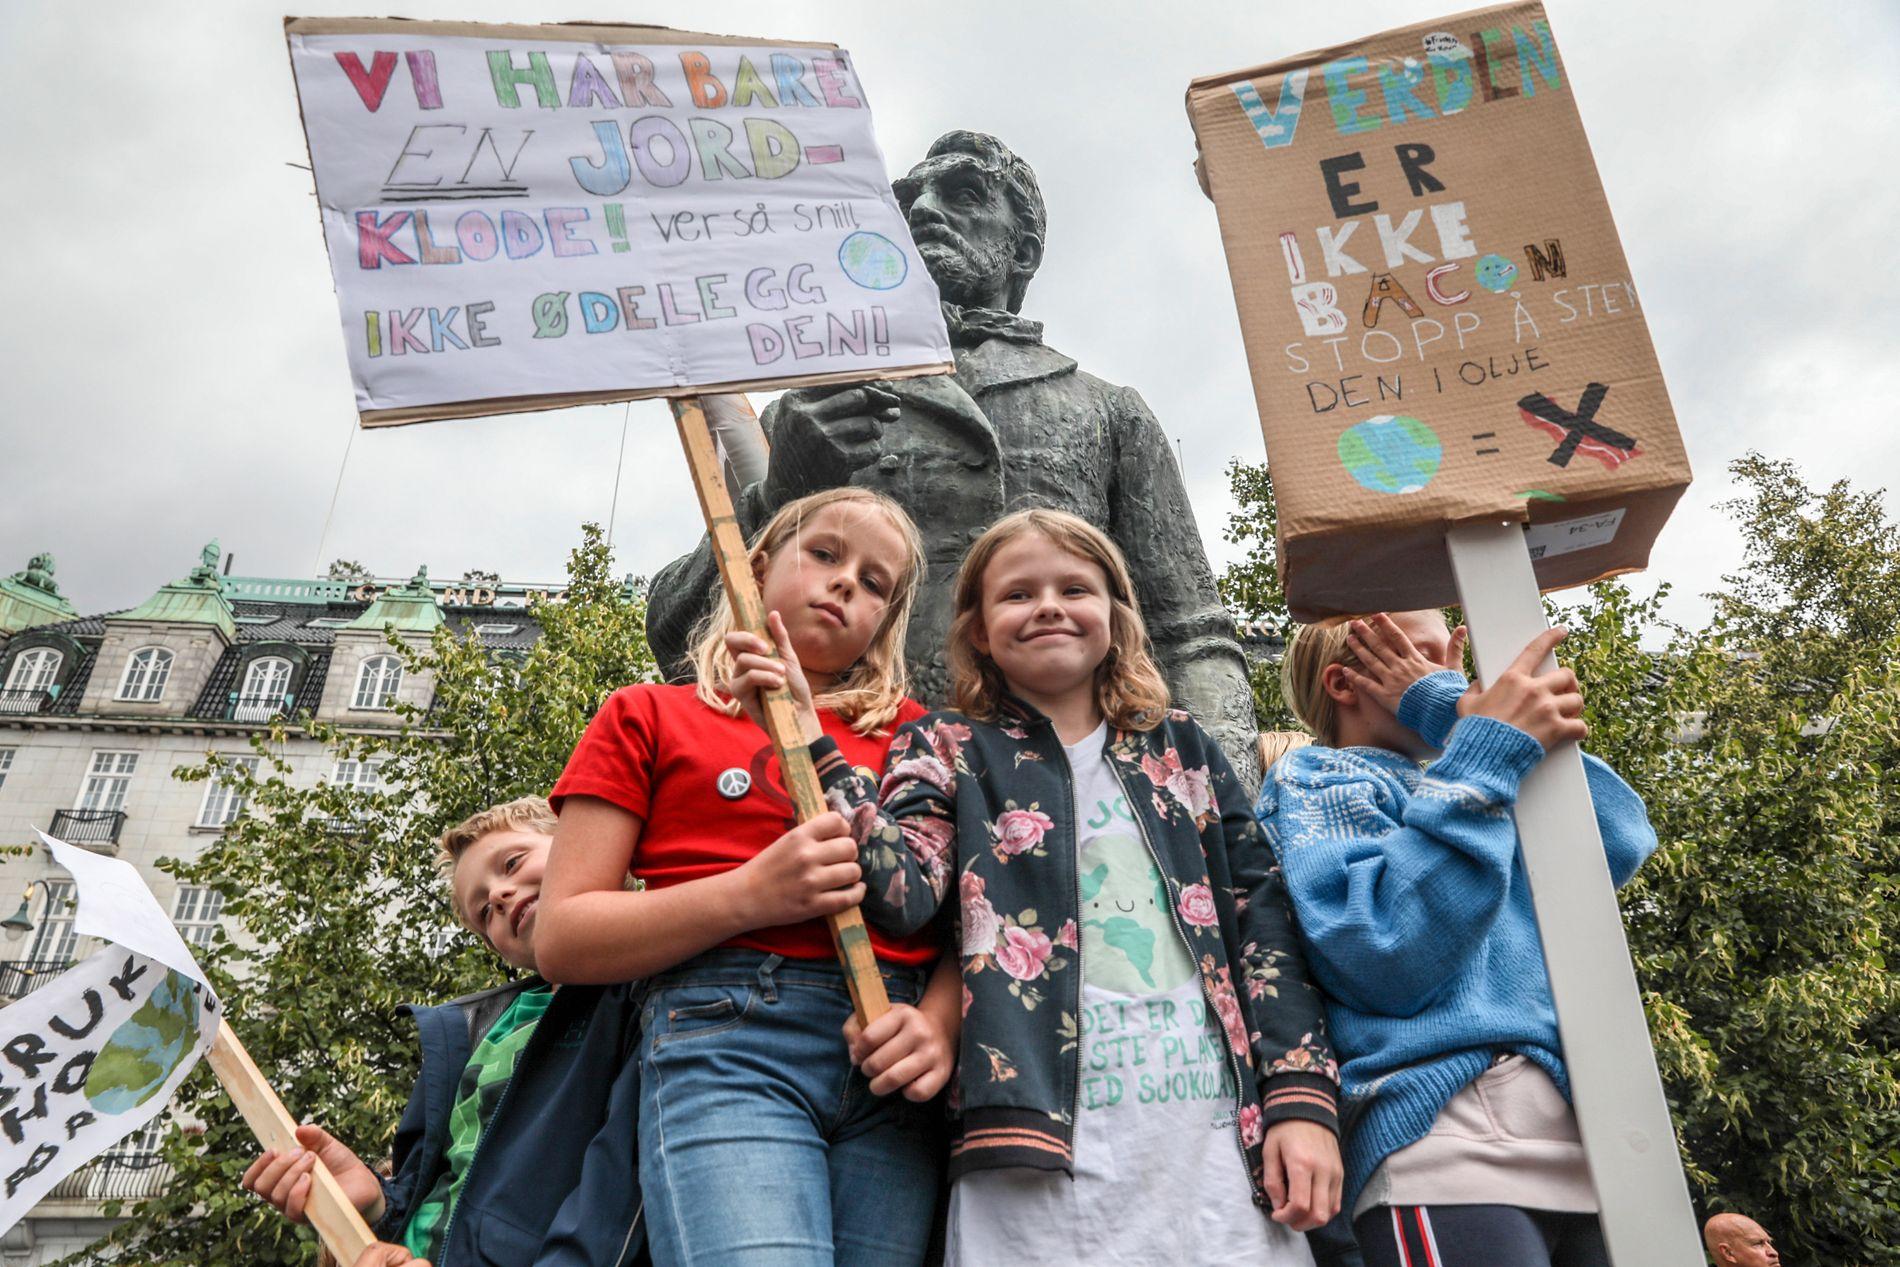 SKOLESTREIK: Knut (8), Ella Vågsland Blaauw (10), Eva Fraser-Green (10) og Ellinor Lund Olsen (12) skolestreiket for klimaet i dag.